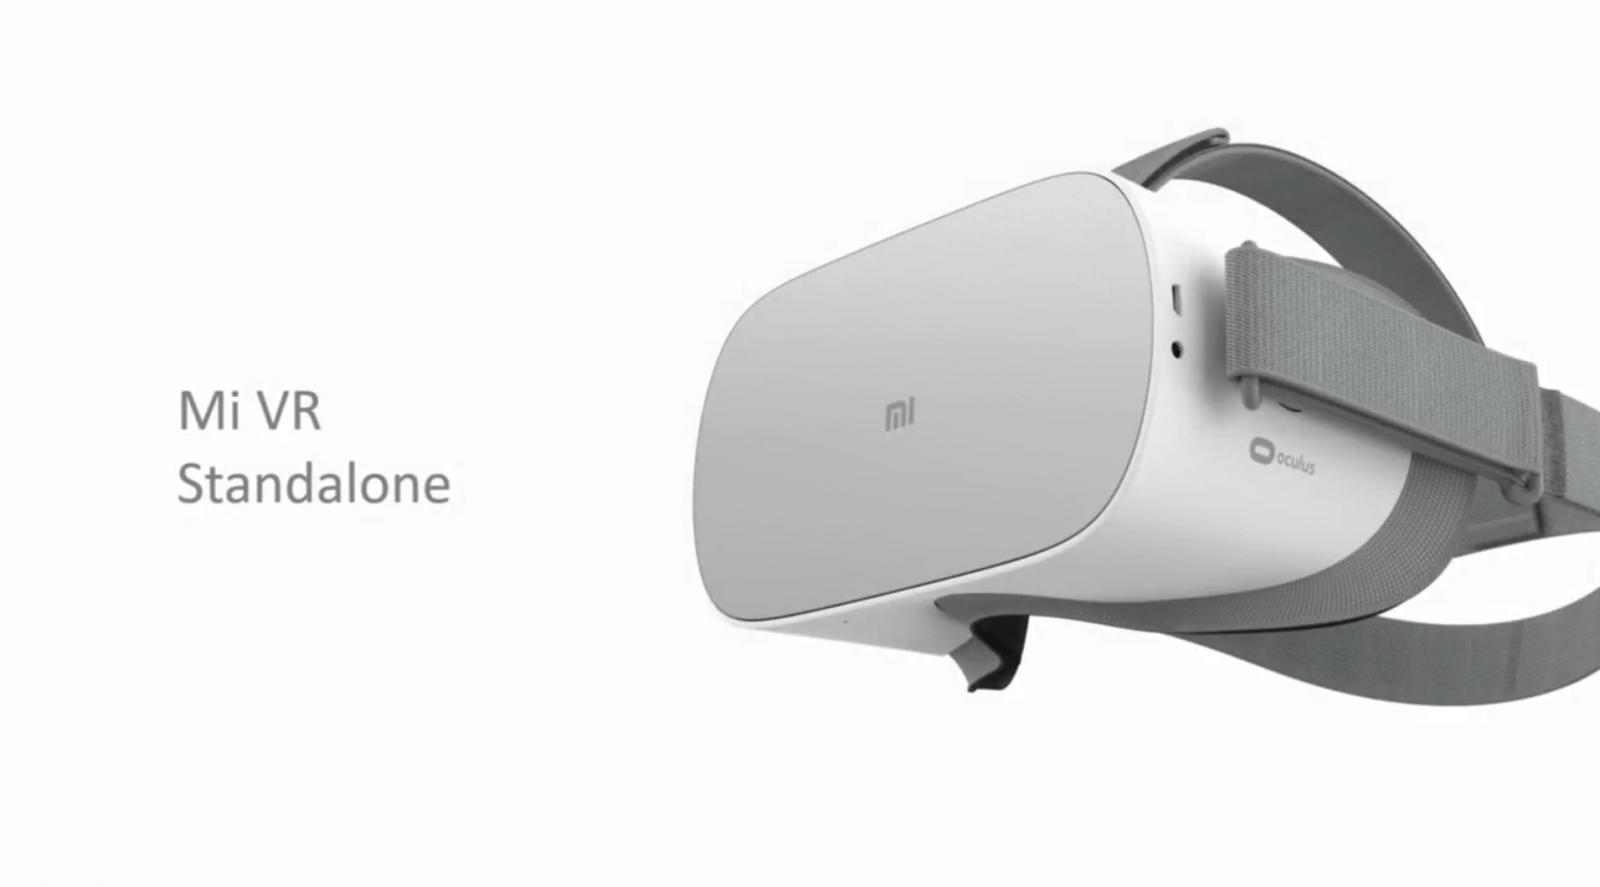 Xiaomi Mi VR Standalone - чего ждать от новинки?